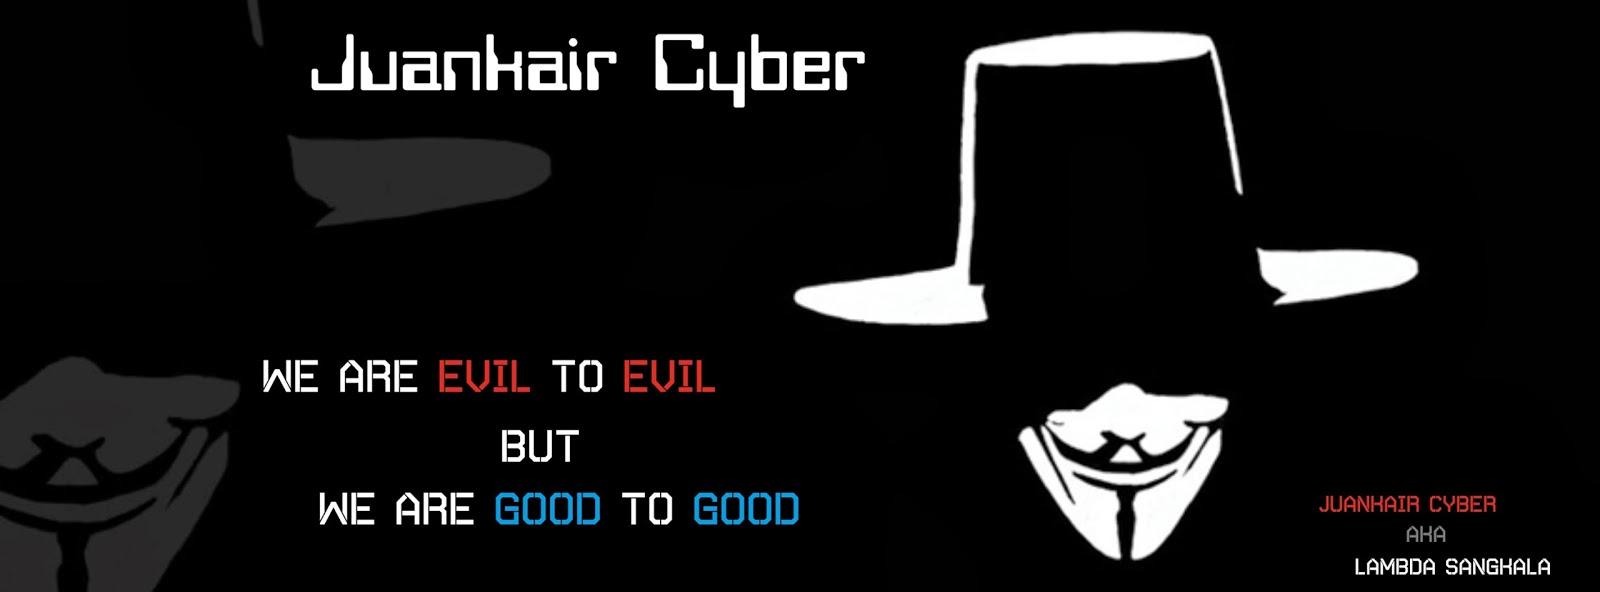 hack a website: